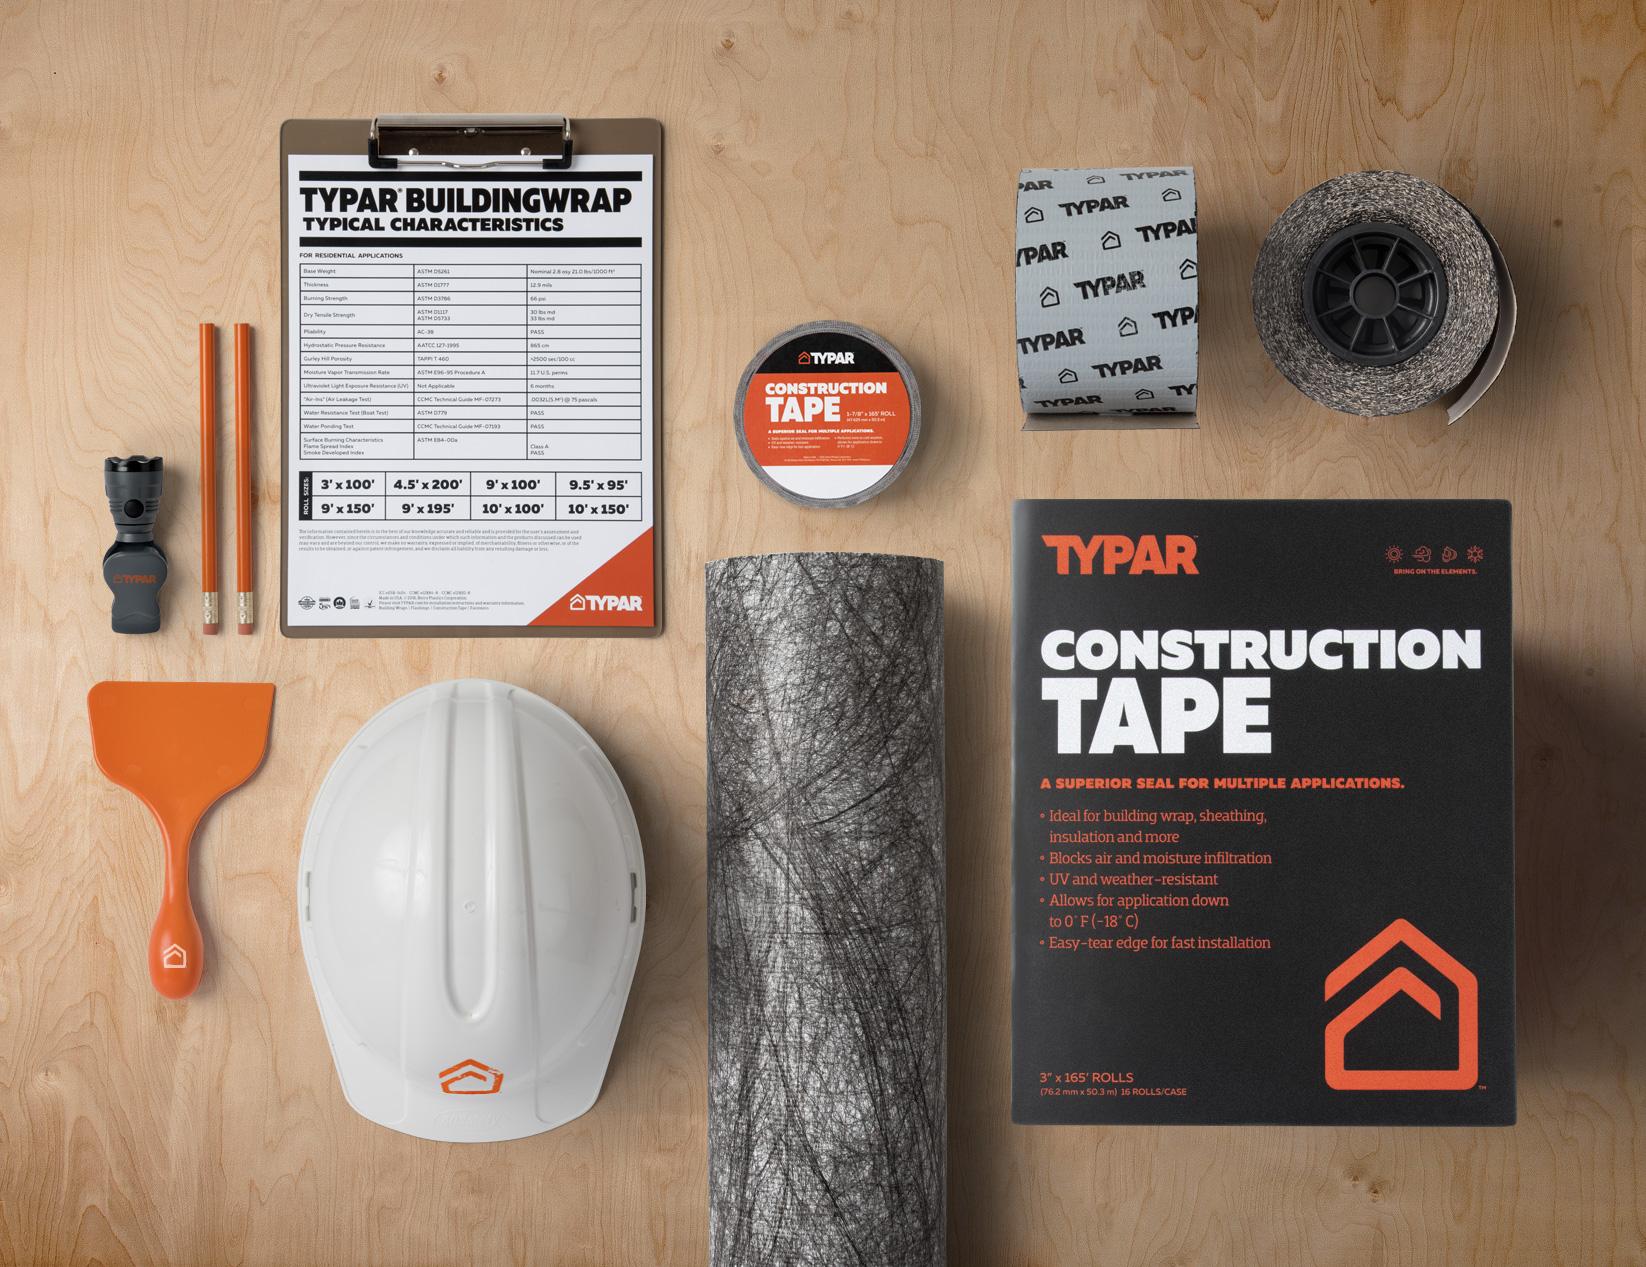 Product Branding & Packaging